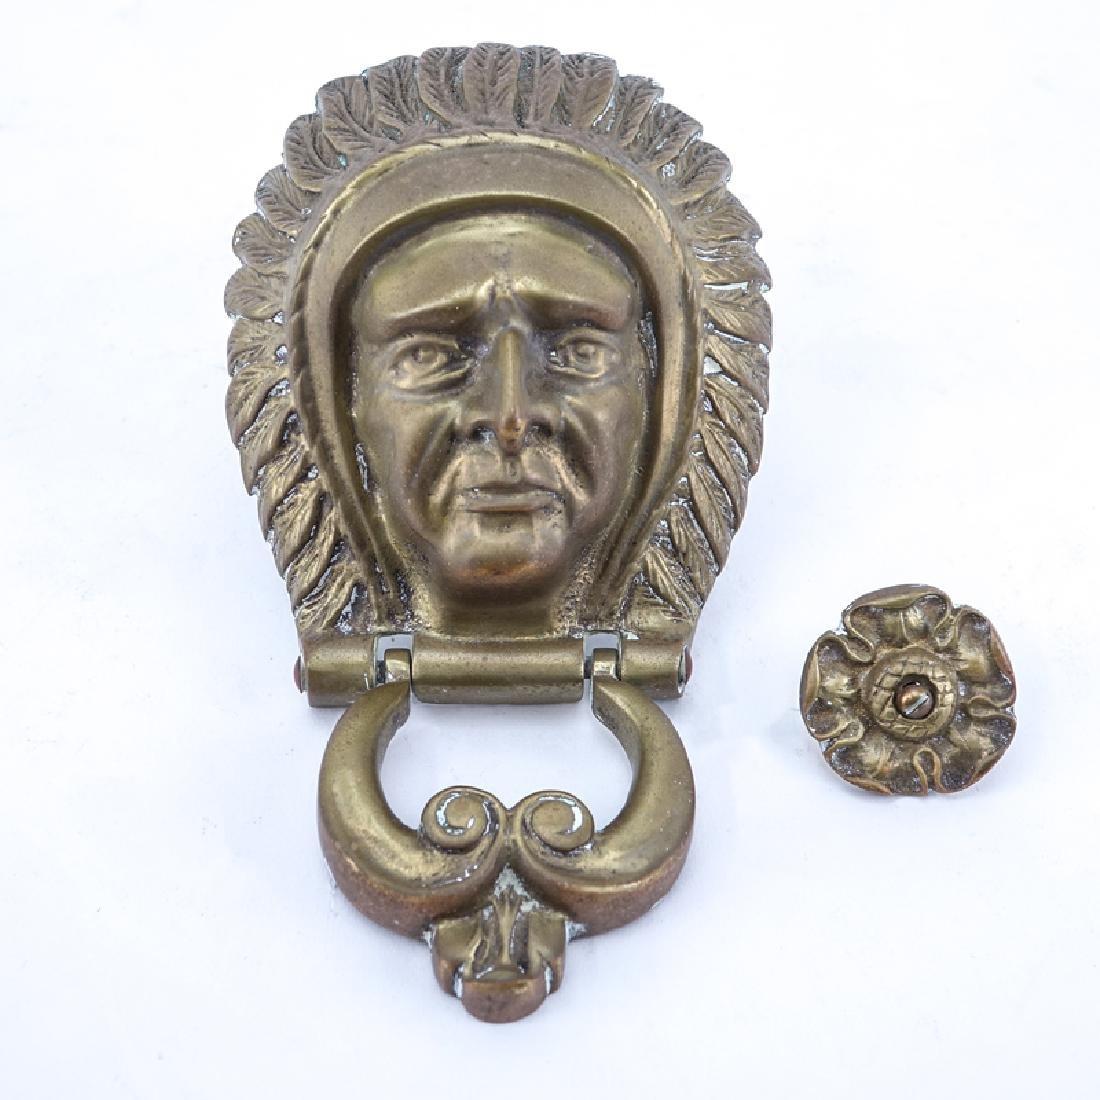 Antique American Indian Brass Door Knocker With Strike